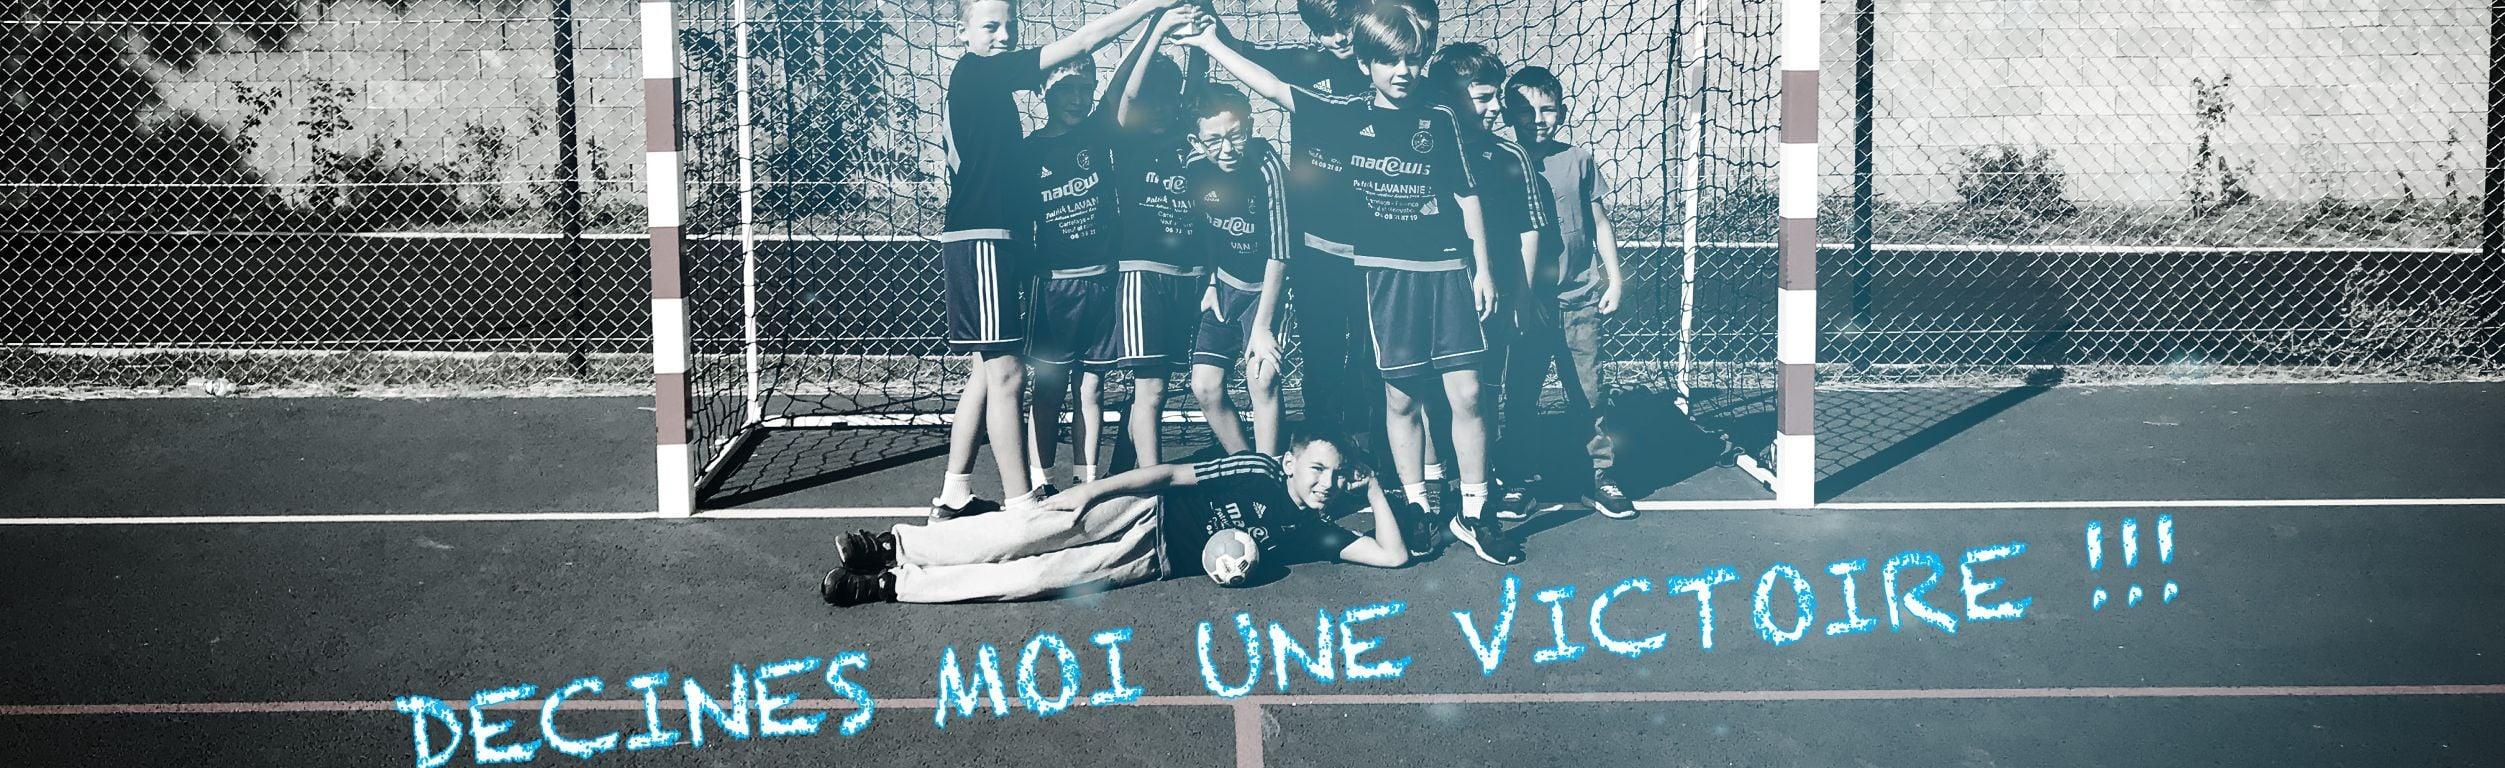 Decines Handball Club